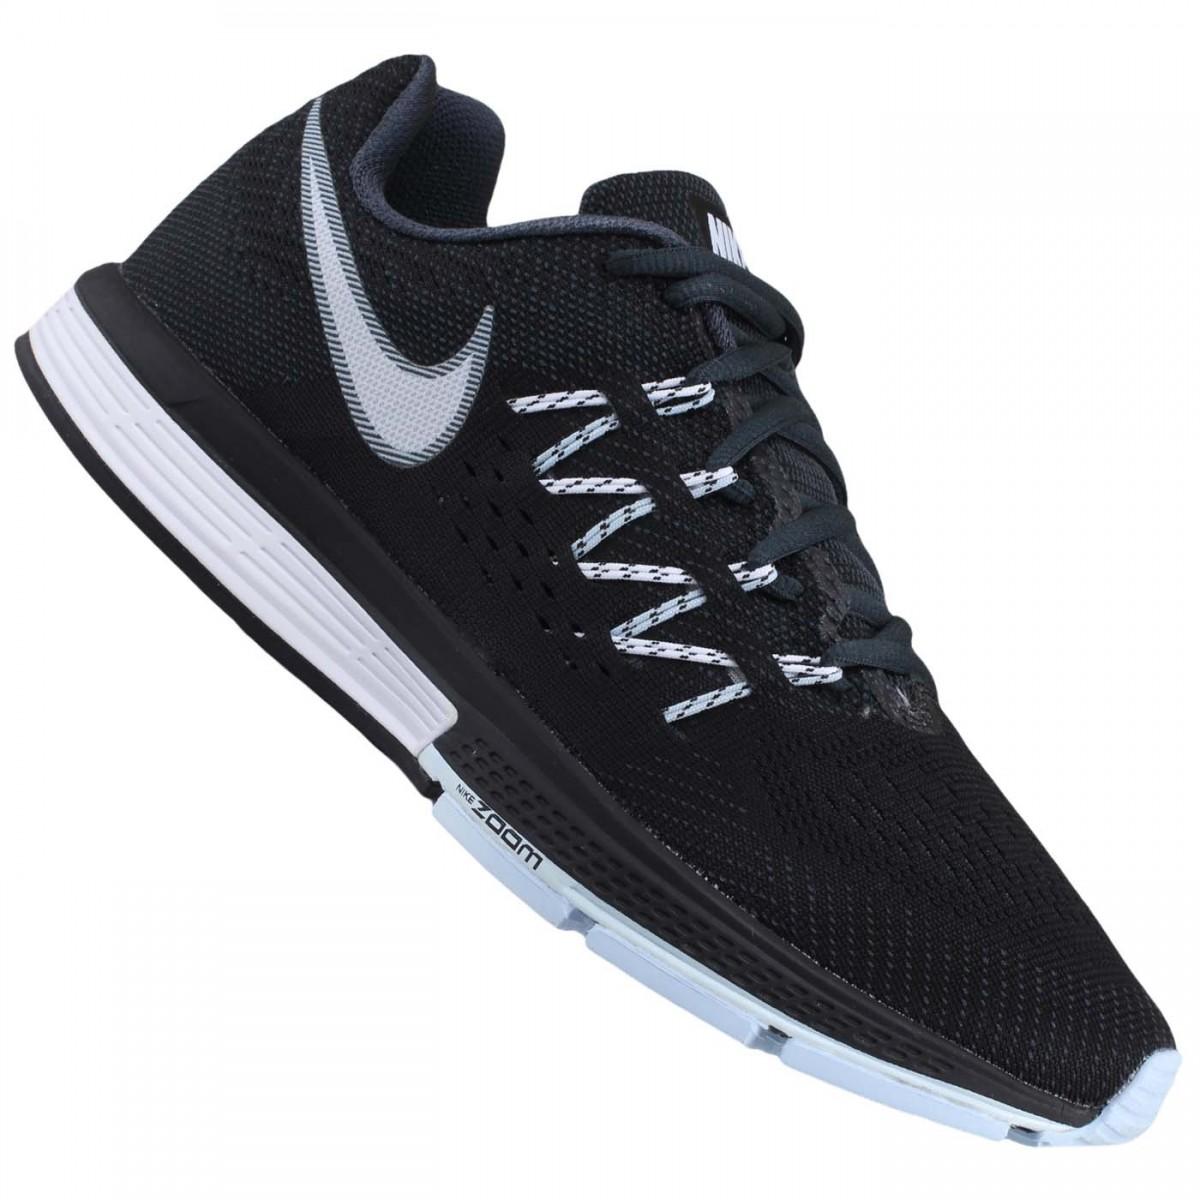 Tênis Nike Air Zoom Vomero 10 - Masculino  3f739cb8e8fba